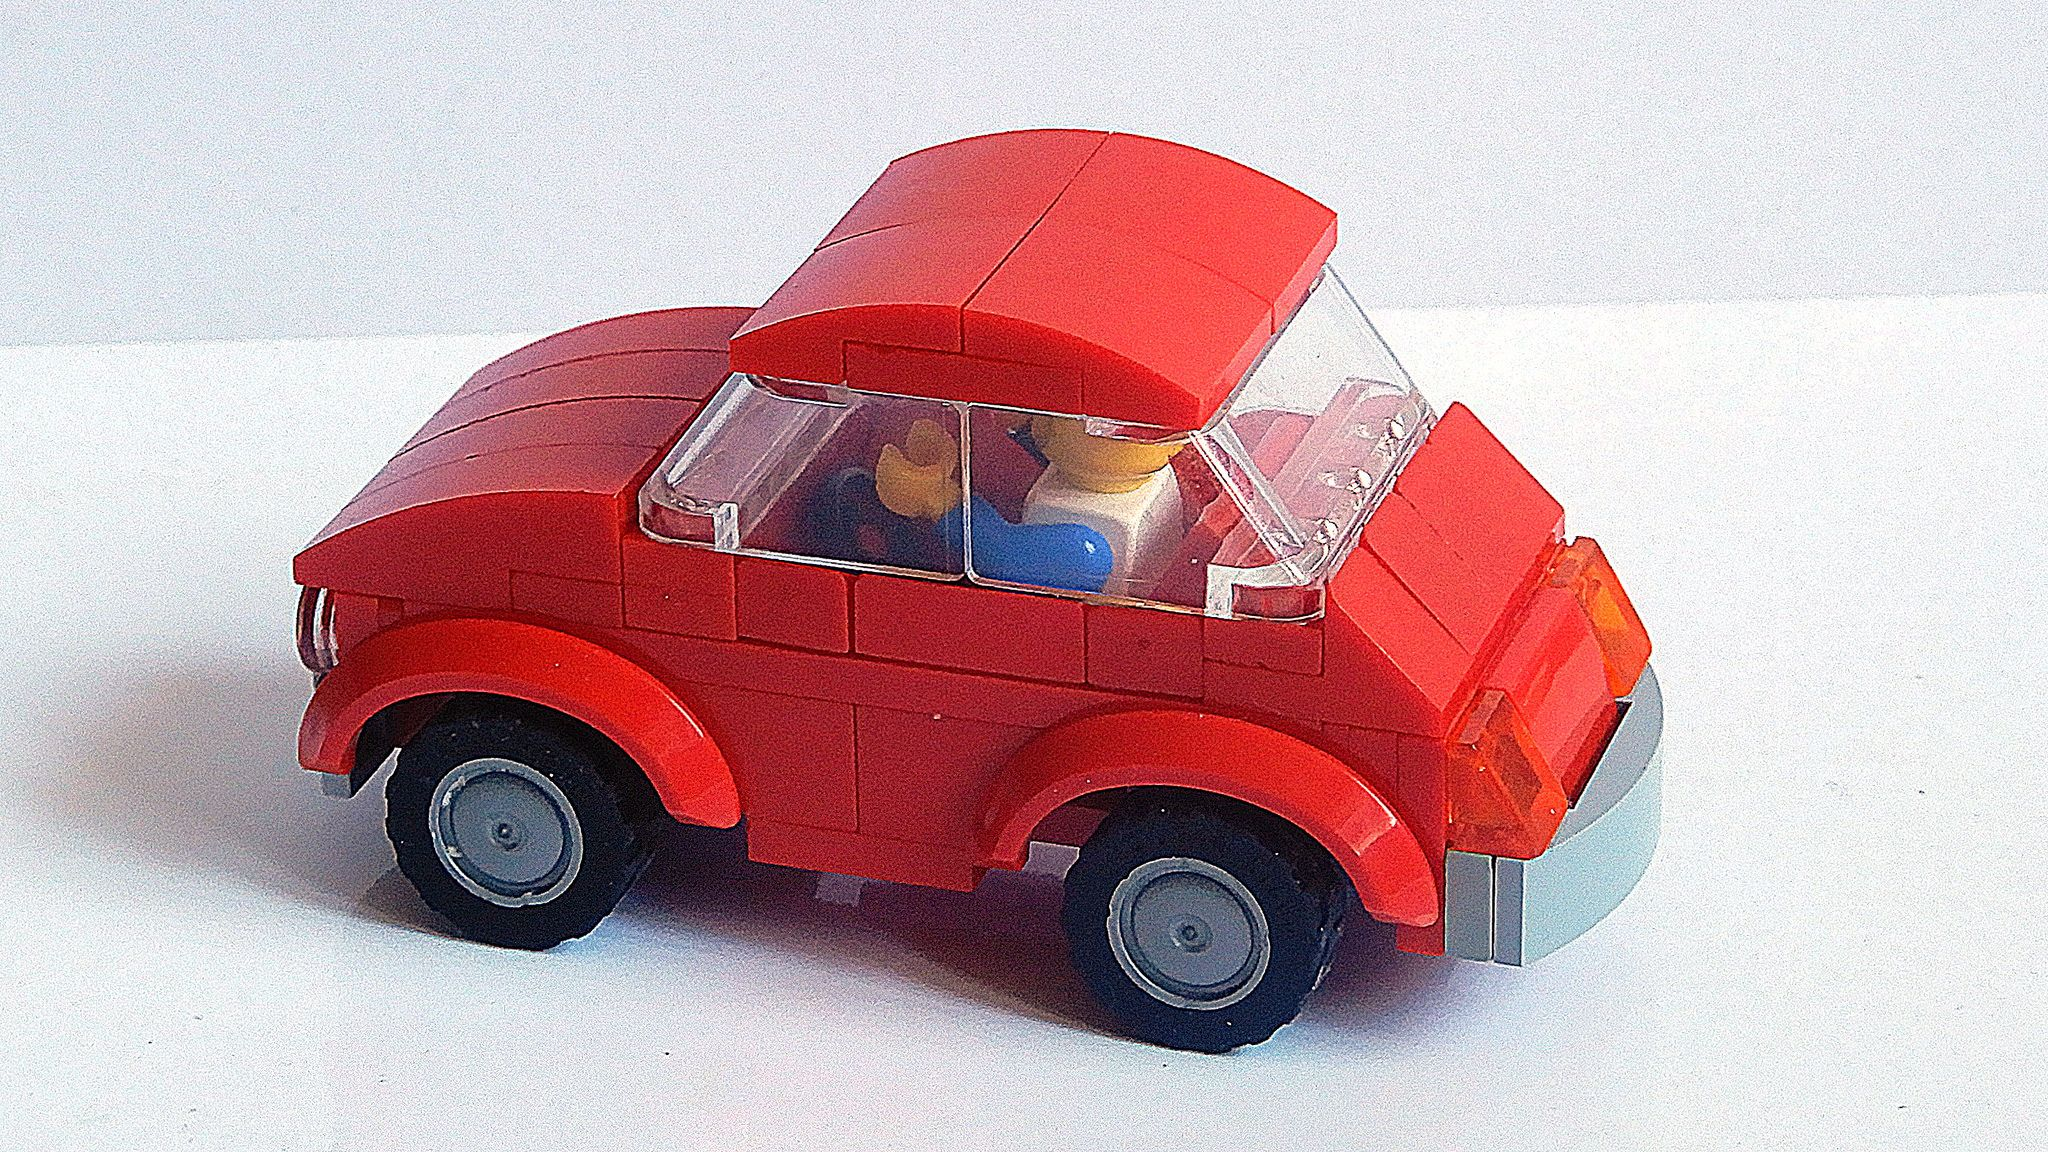 Lego Fiat 500 Cinquecento Moc 4k Lego Cars Lego Lego Sets